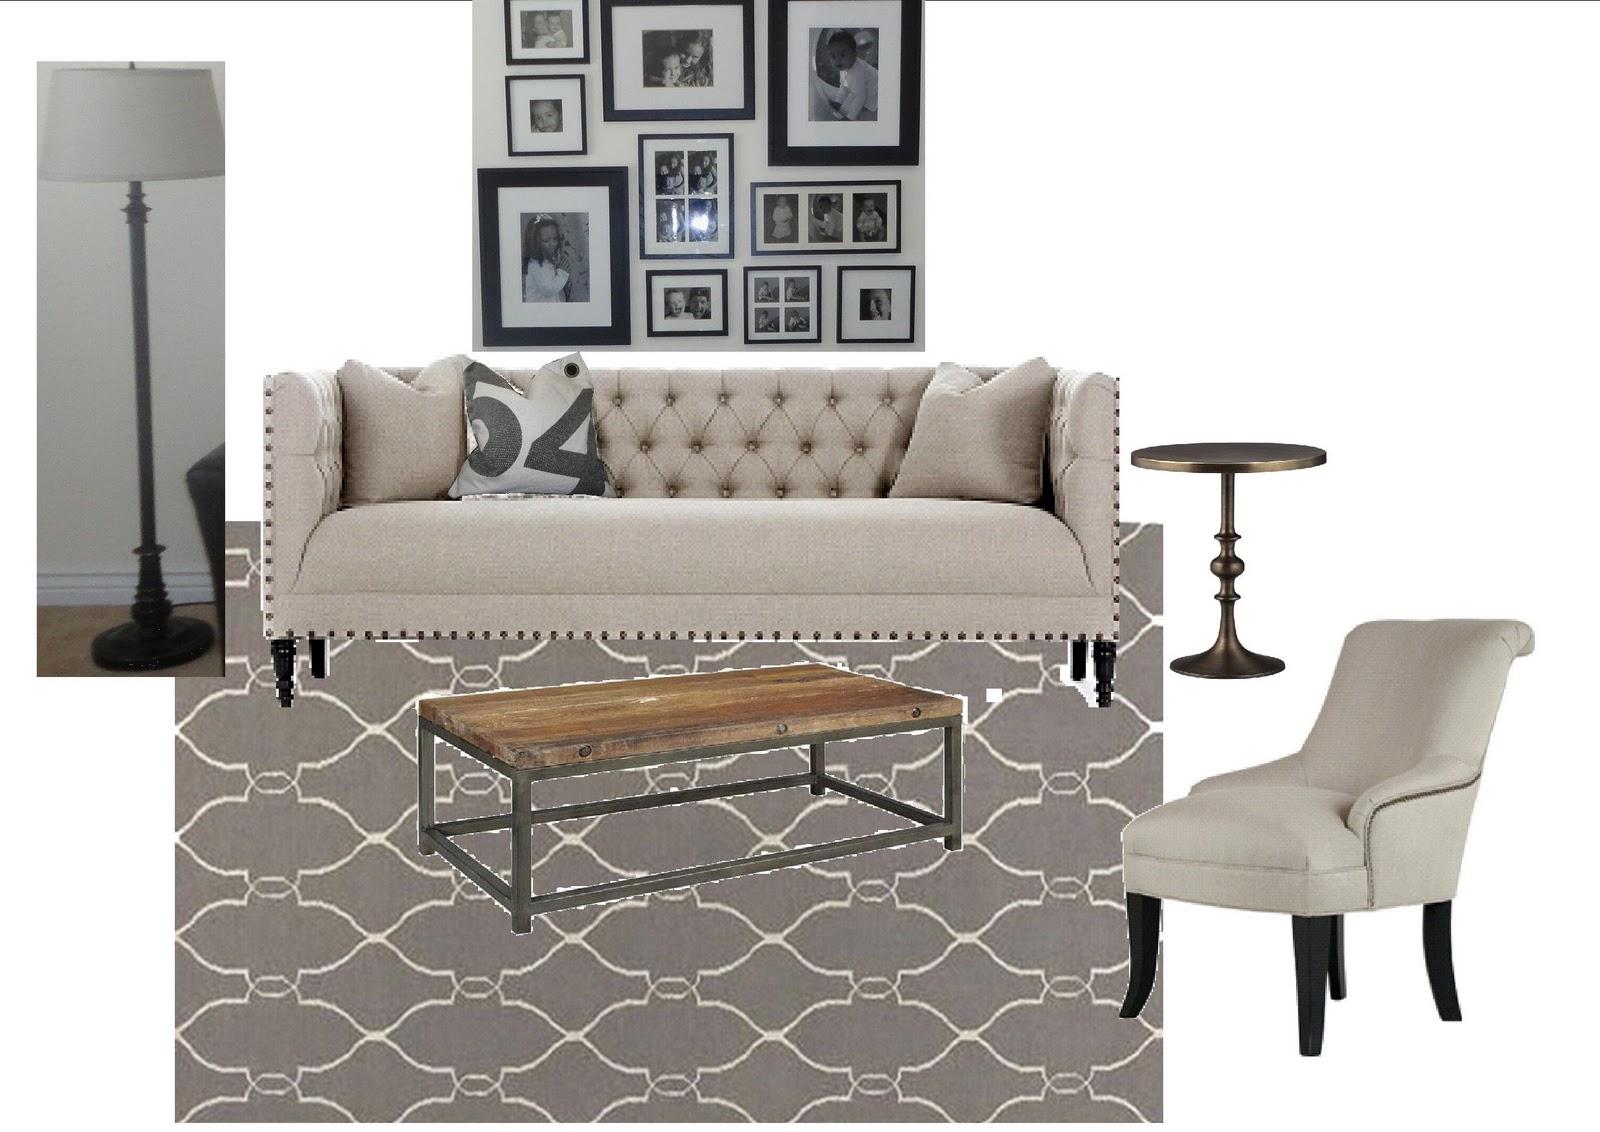 csn rugs gray fallon 5x8 $ 345 plus free shipping title=